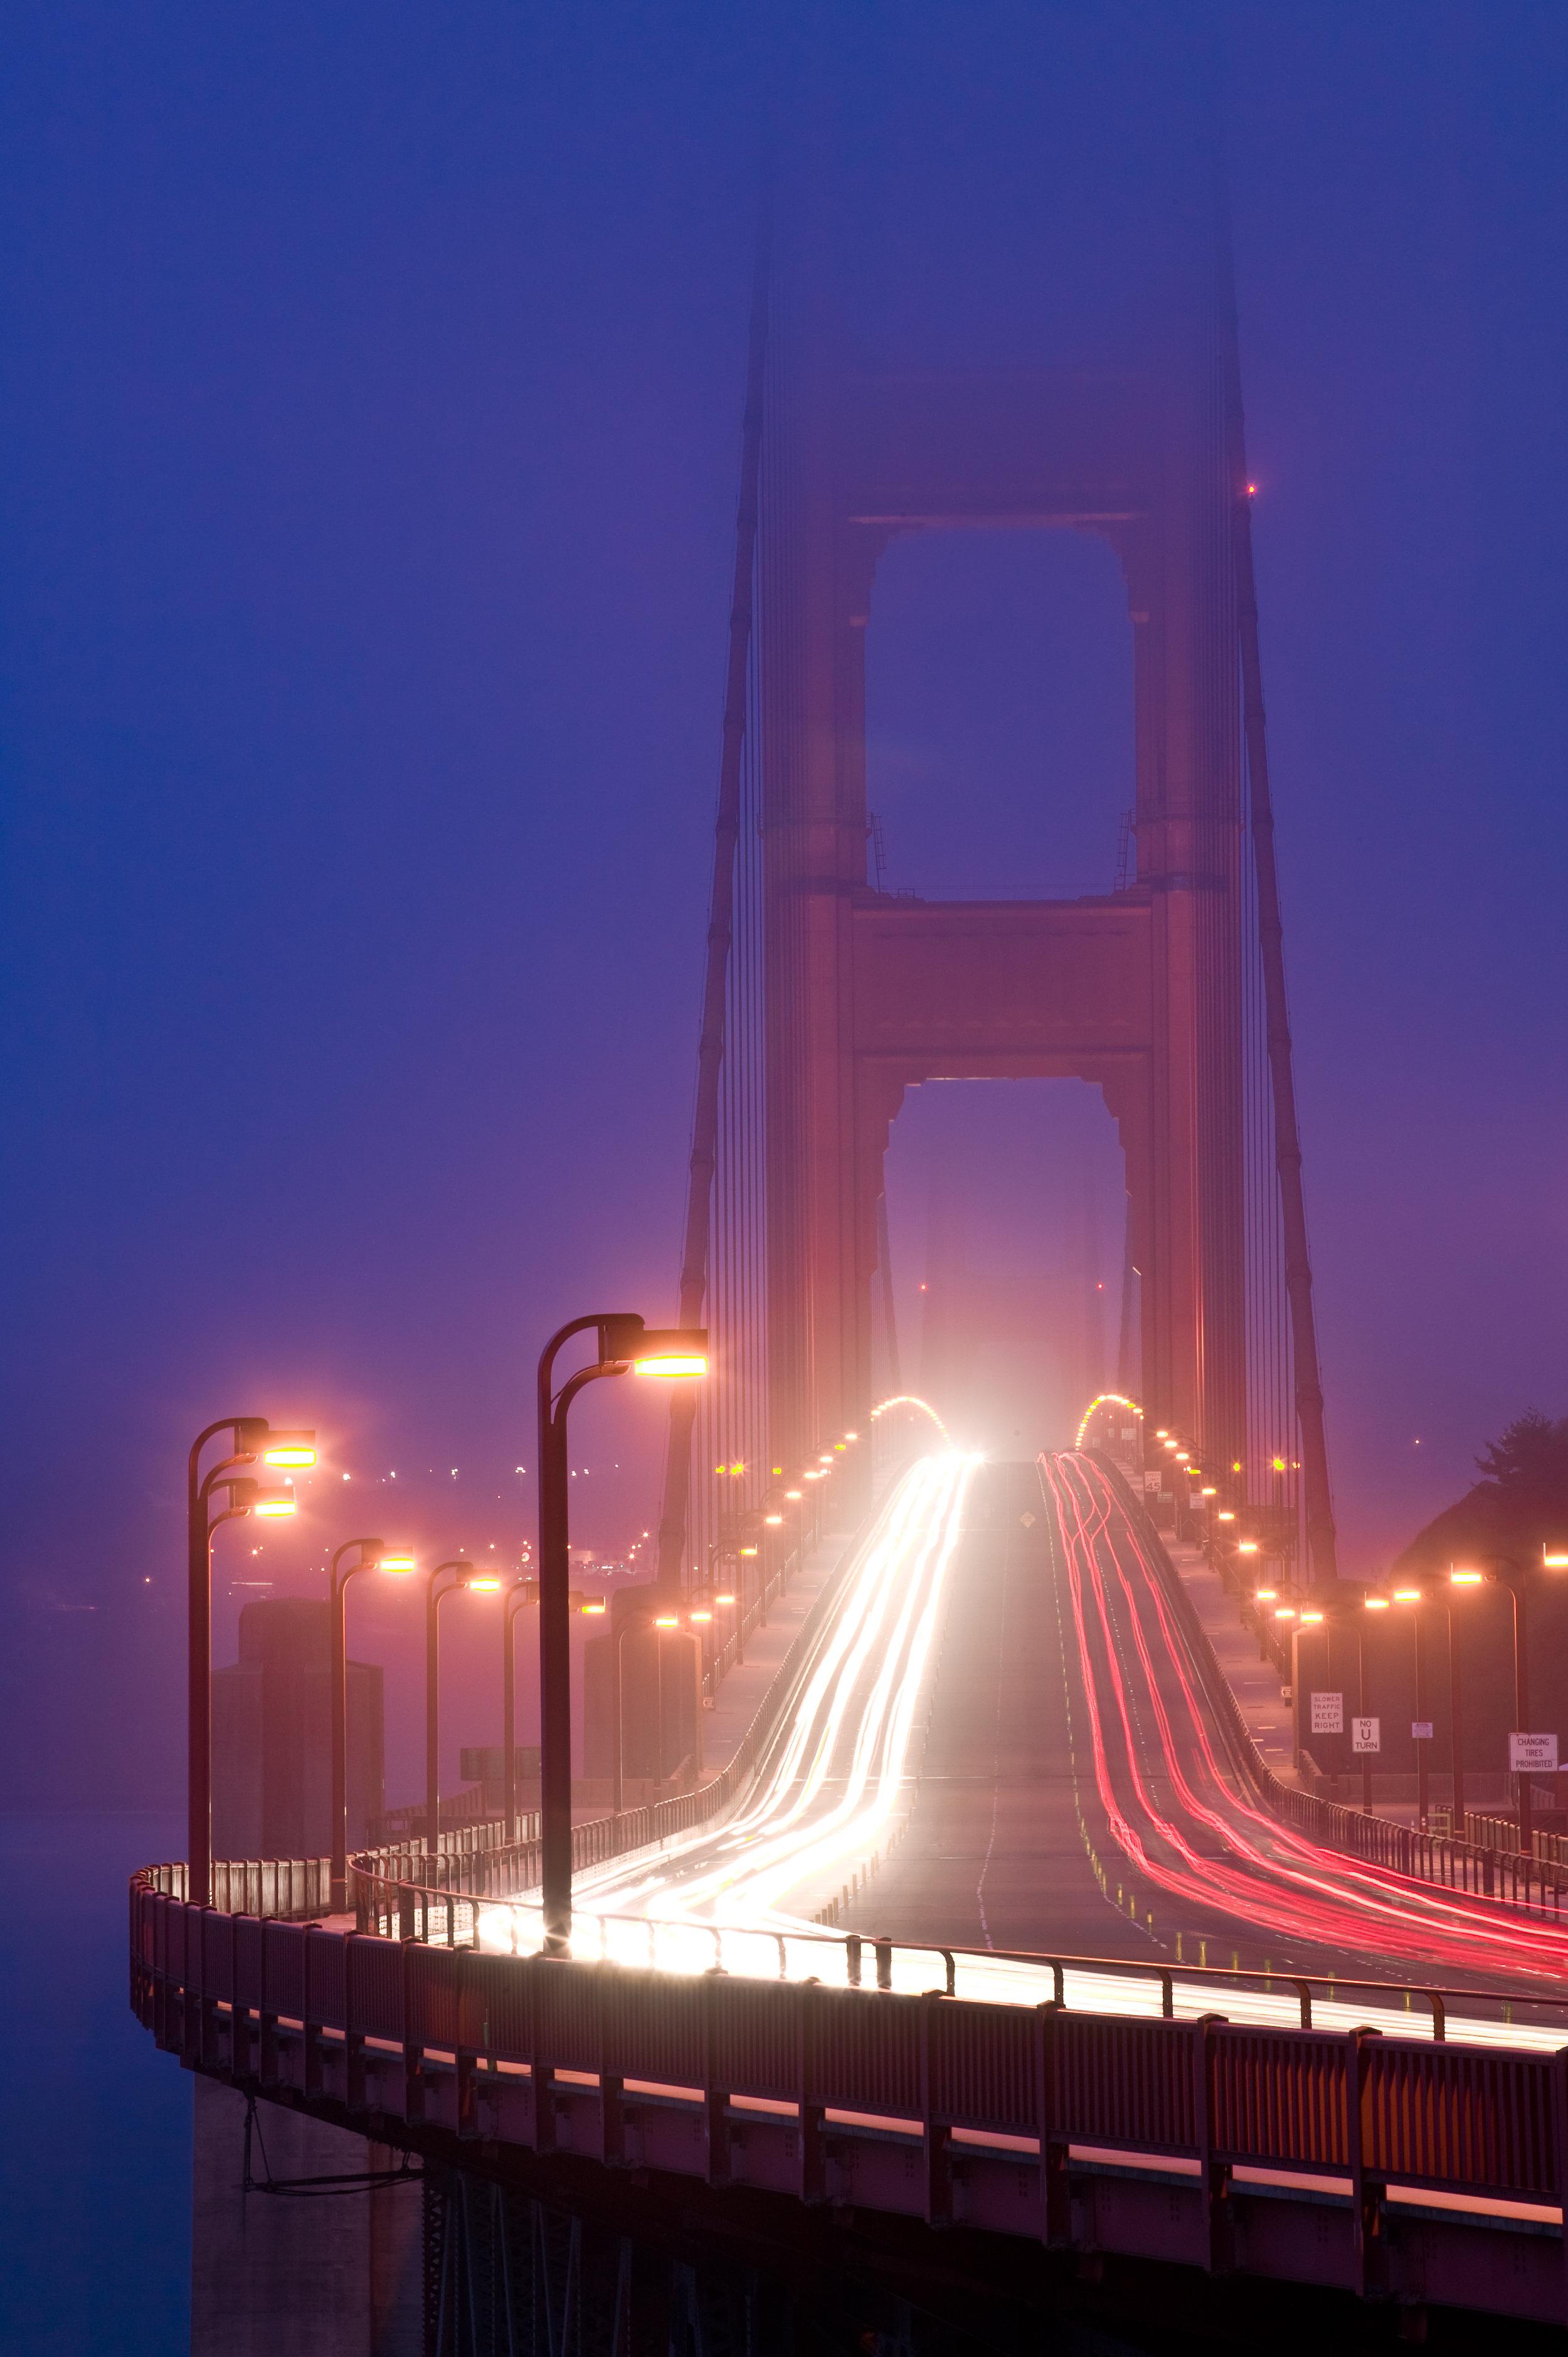 Golden Gate Bridge, Car Trails, Fog